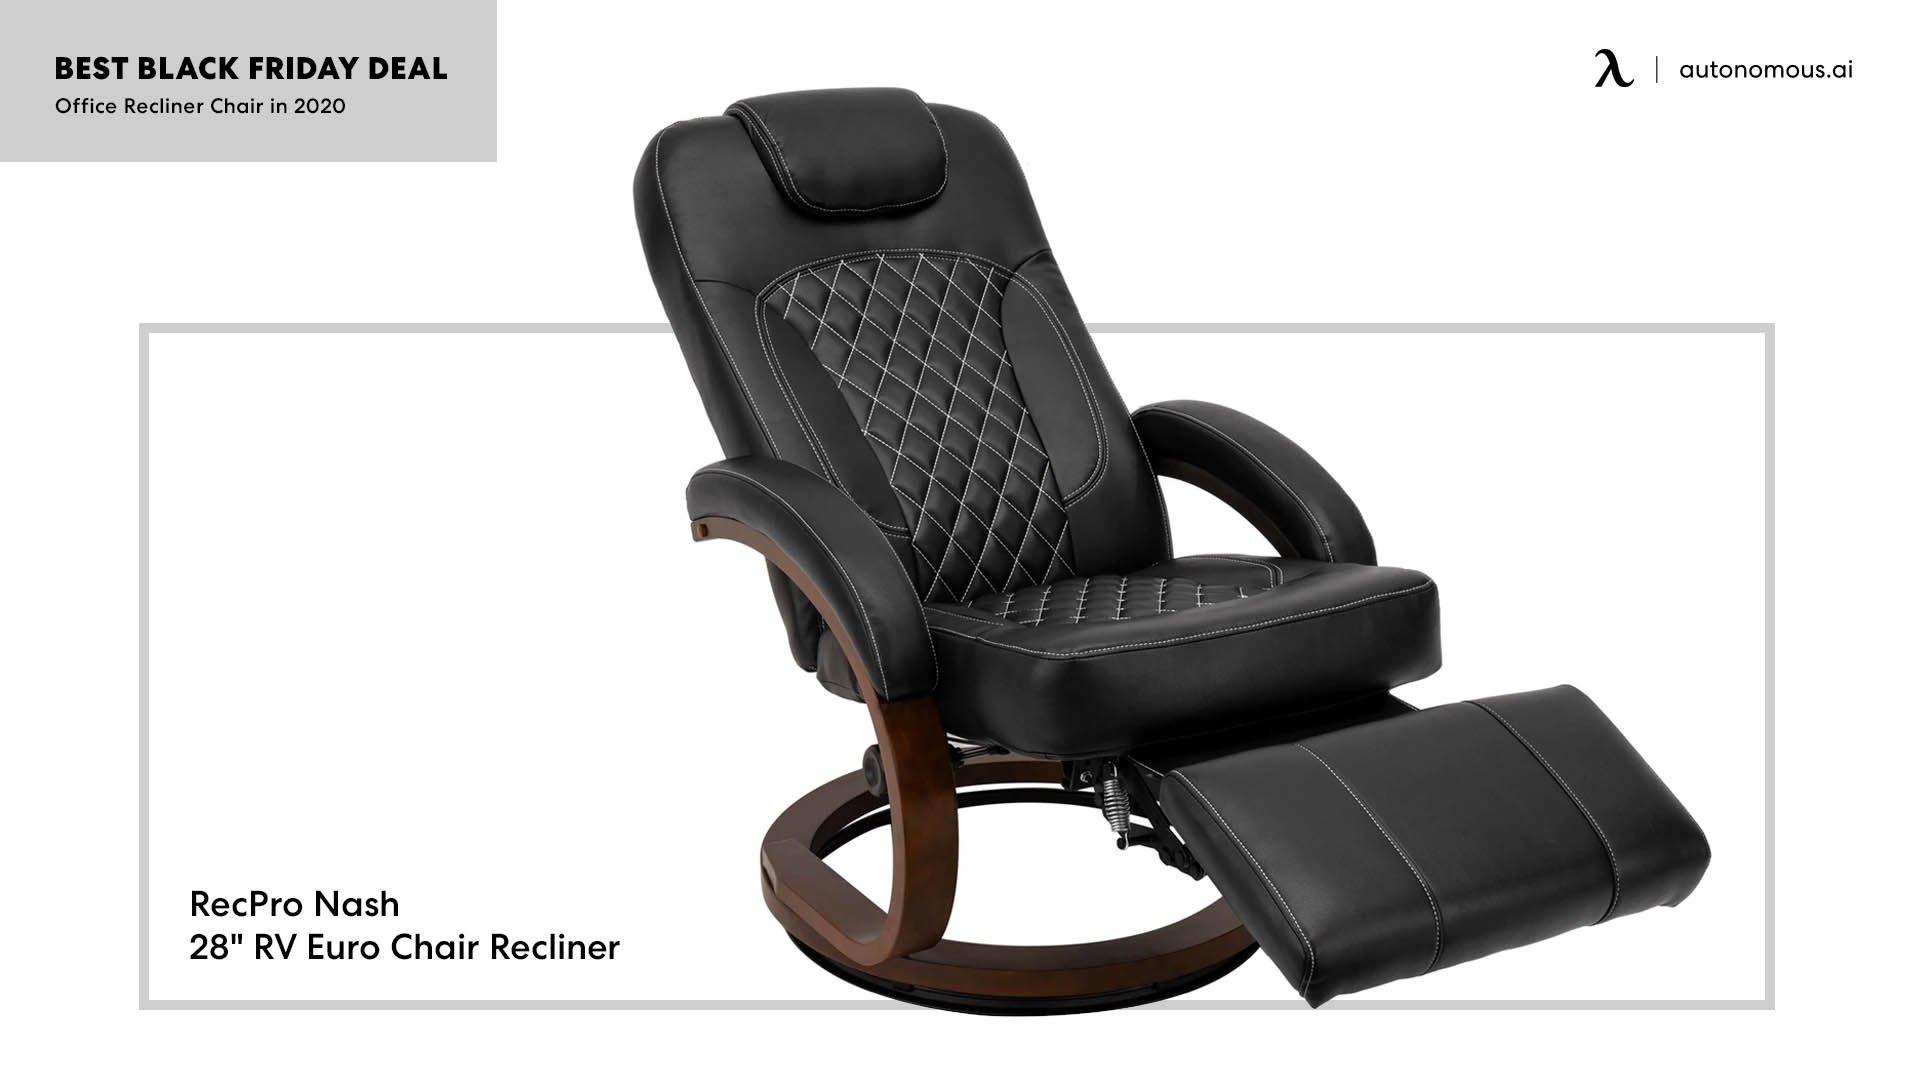 "RecPro Nash 28"" RV Euro Chair Recliner in Black RV Furniture"